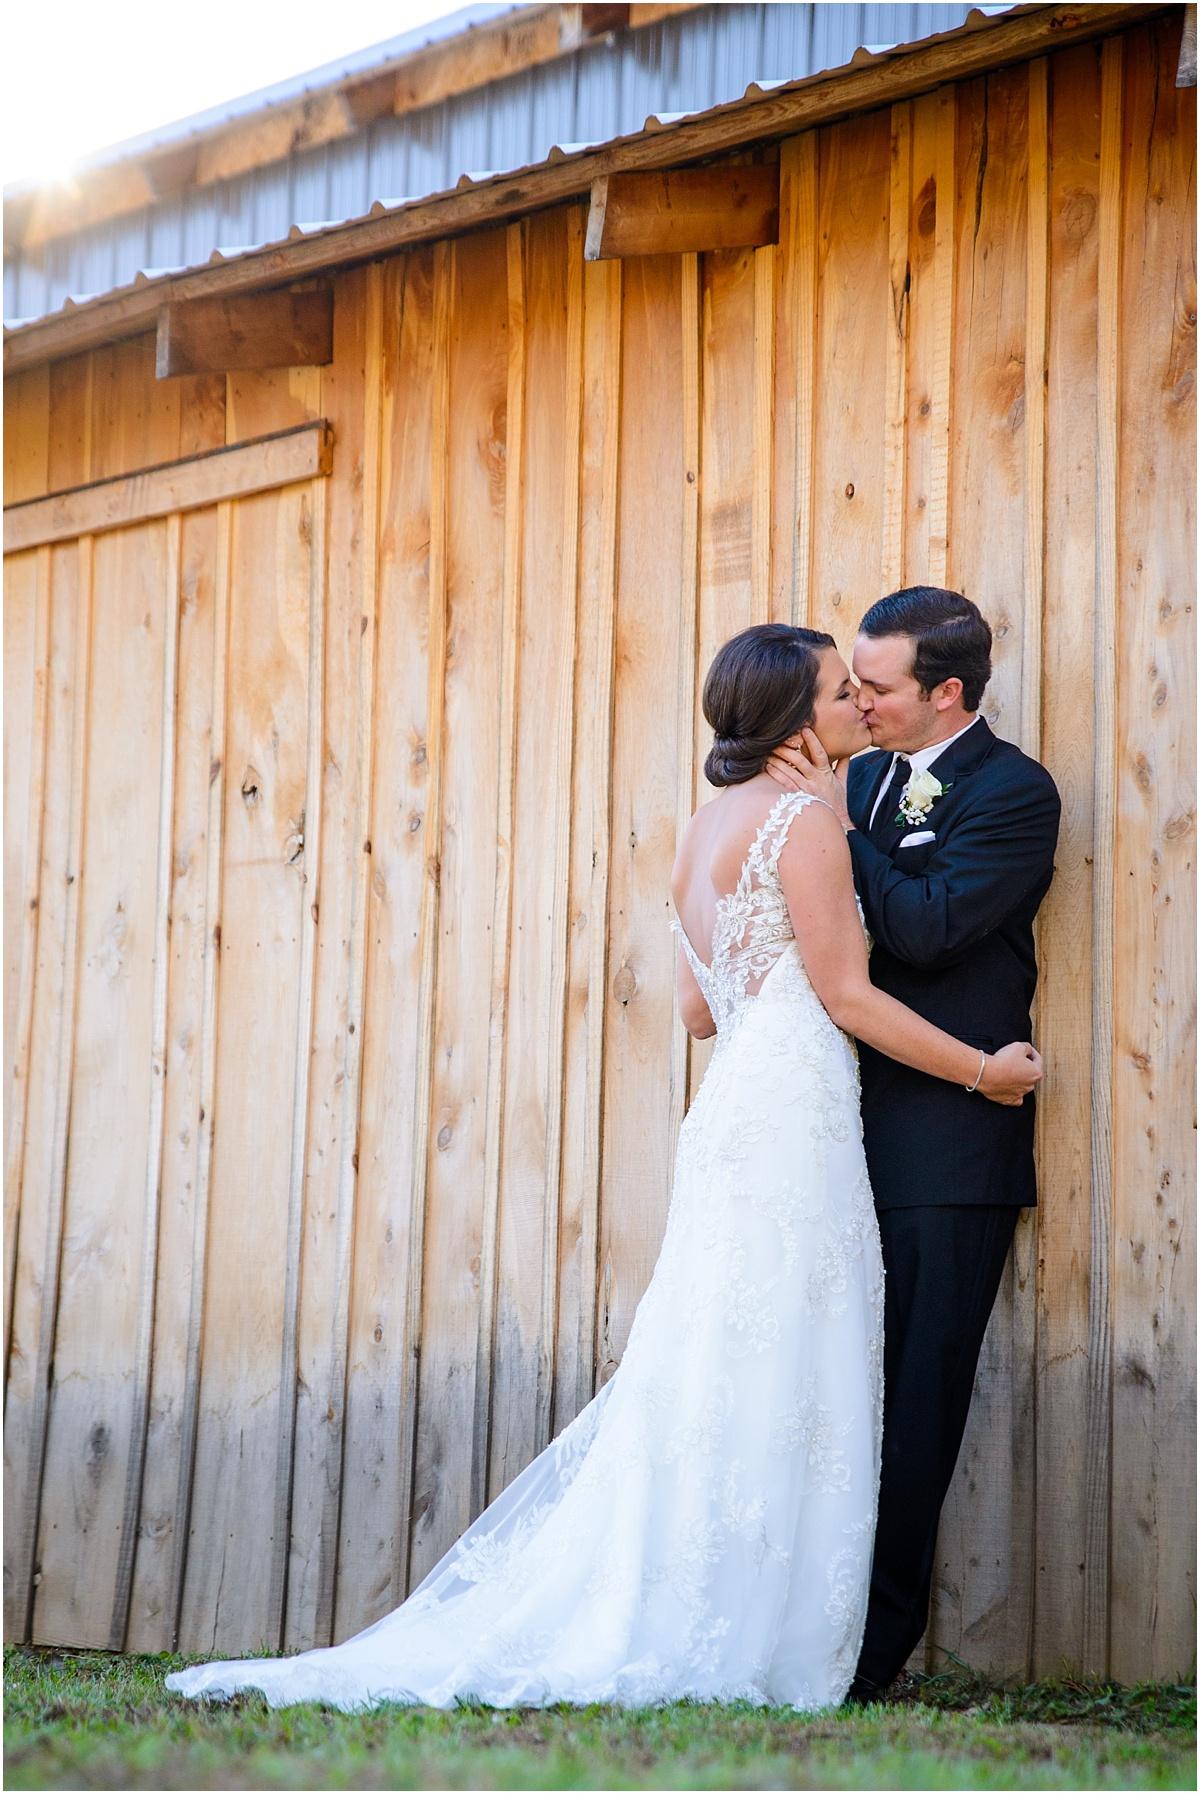 Greg Smit Photography Nashville wedding photographer Tomlinson Family Farm_0023